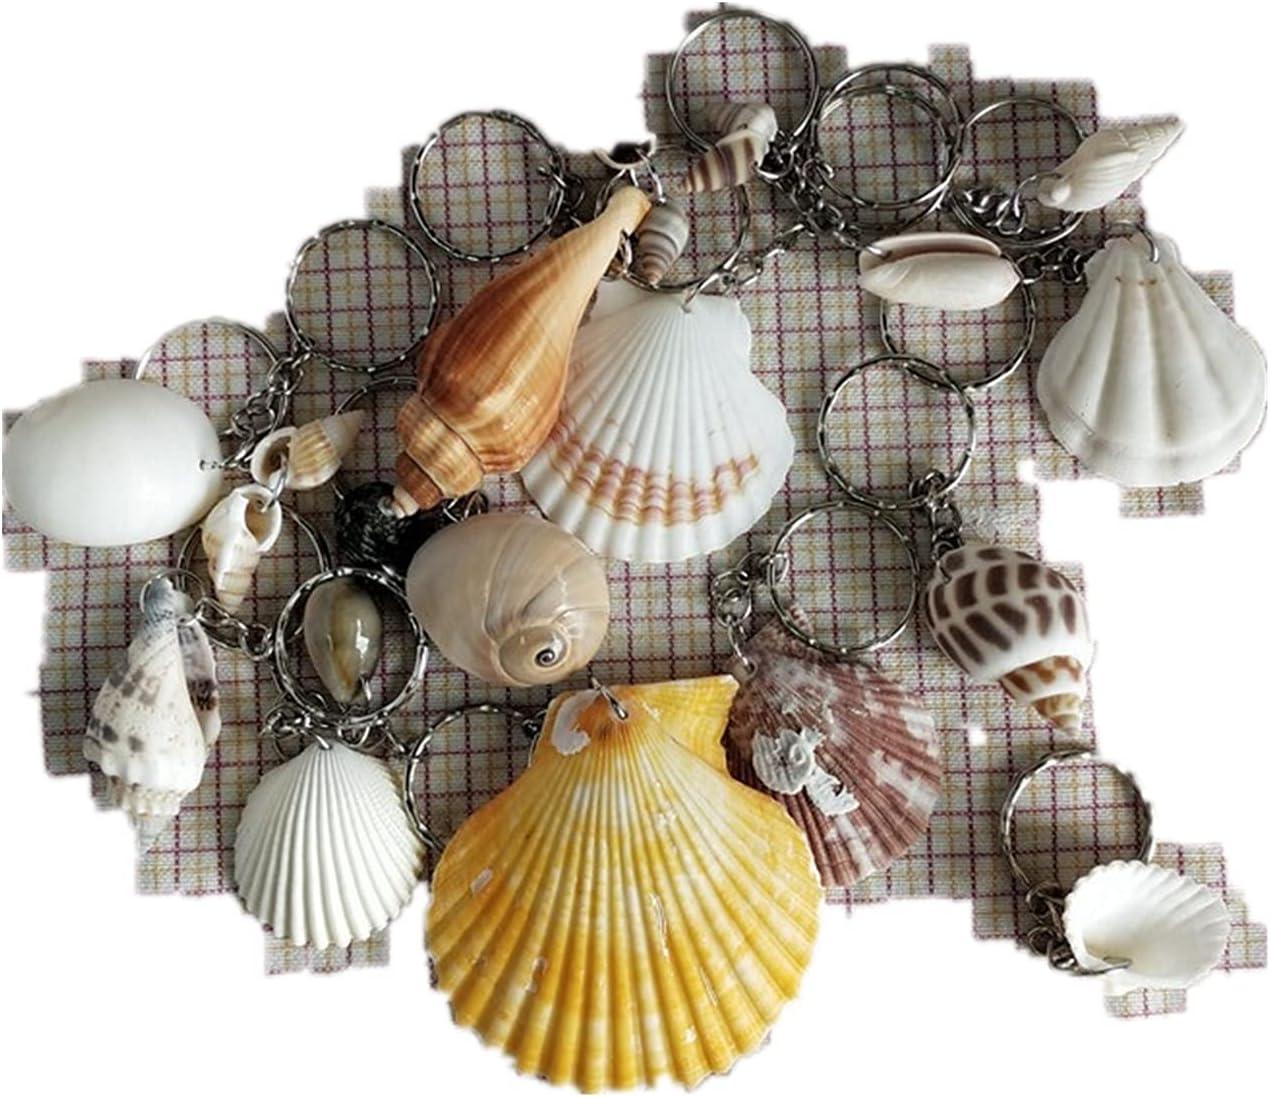 TL TONGLING Shells 10pcs Nautical Scallop Sea Shells Charms Crafts Colorful Pendant Keychain Bag Car Keyring Souvenirs Gifts